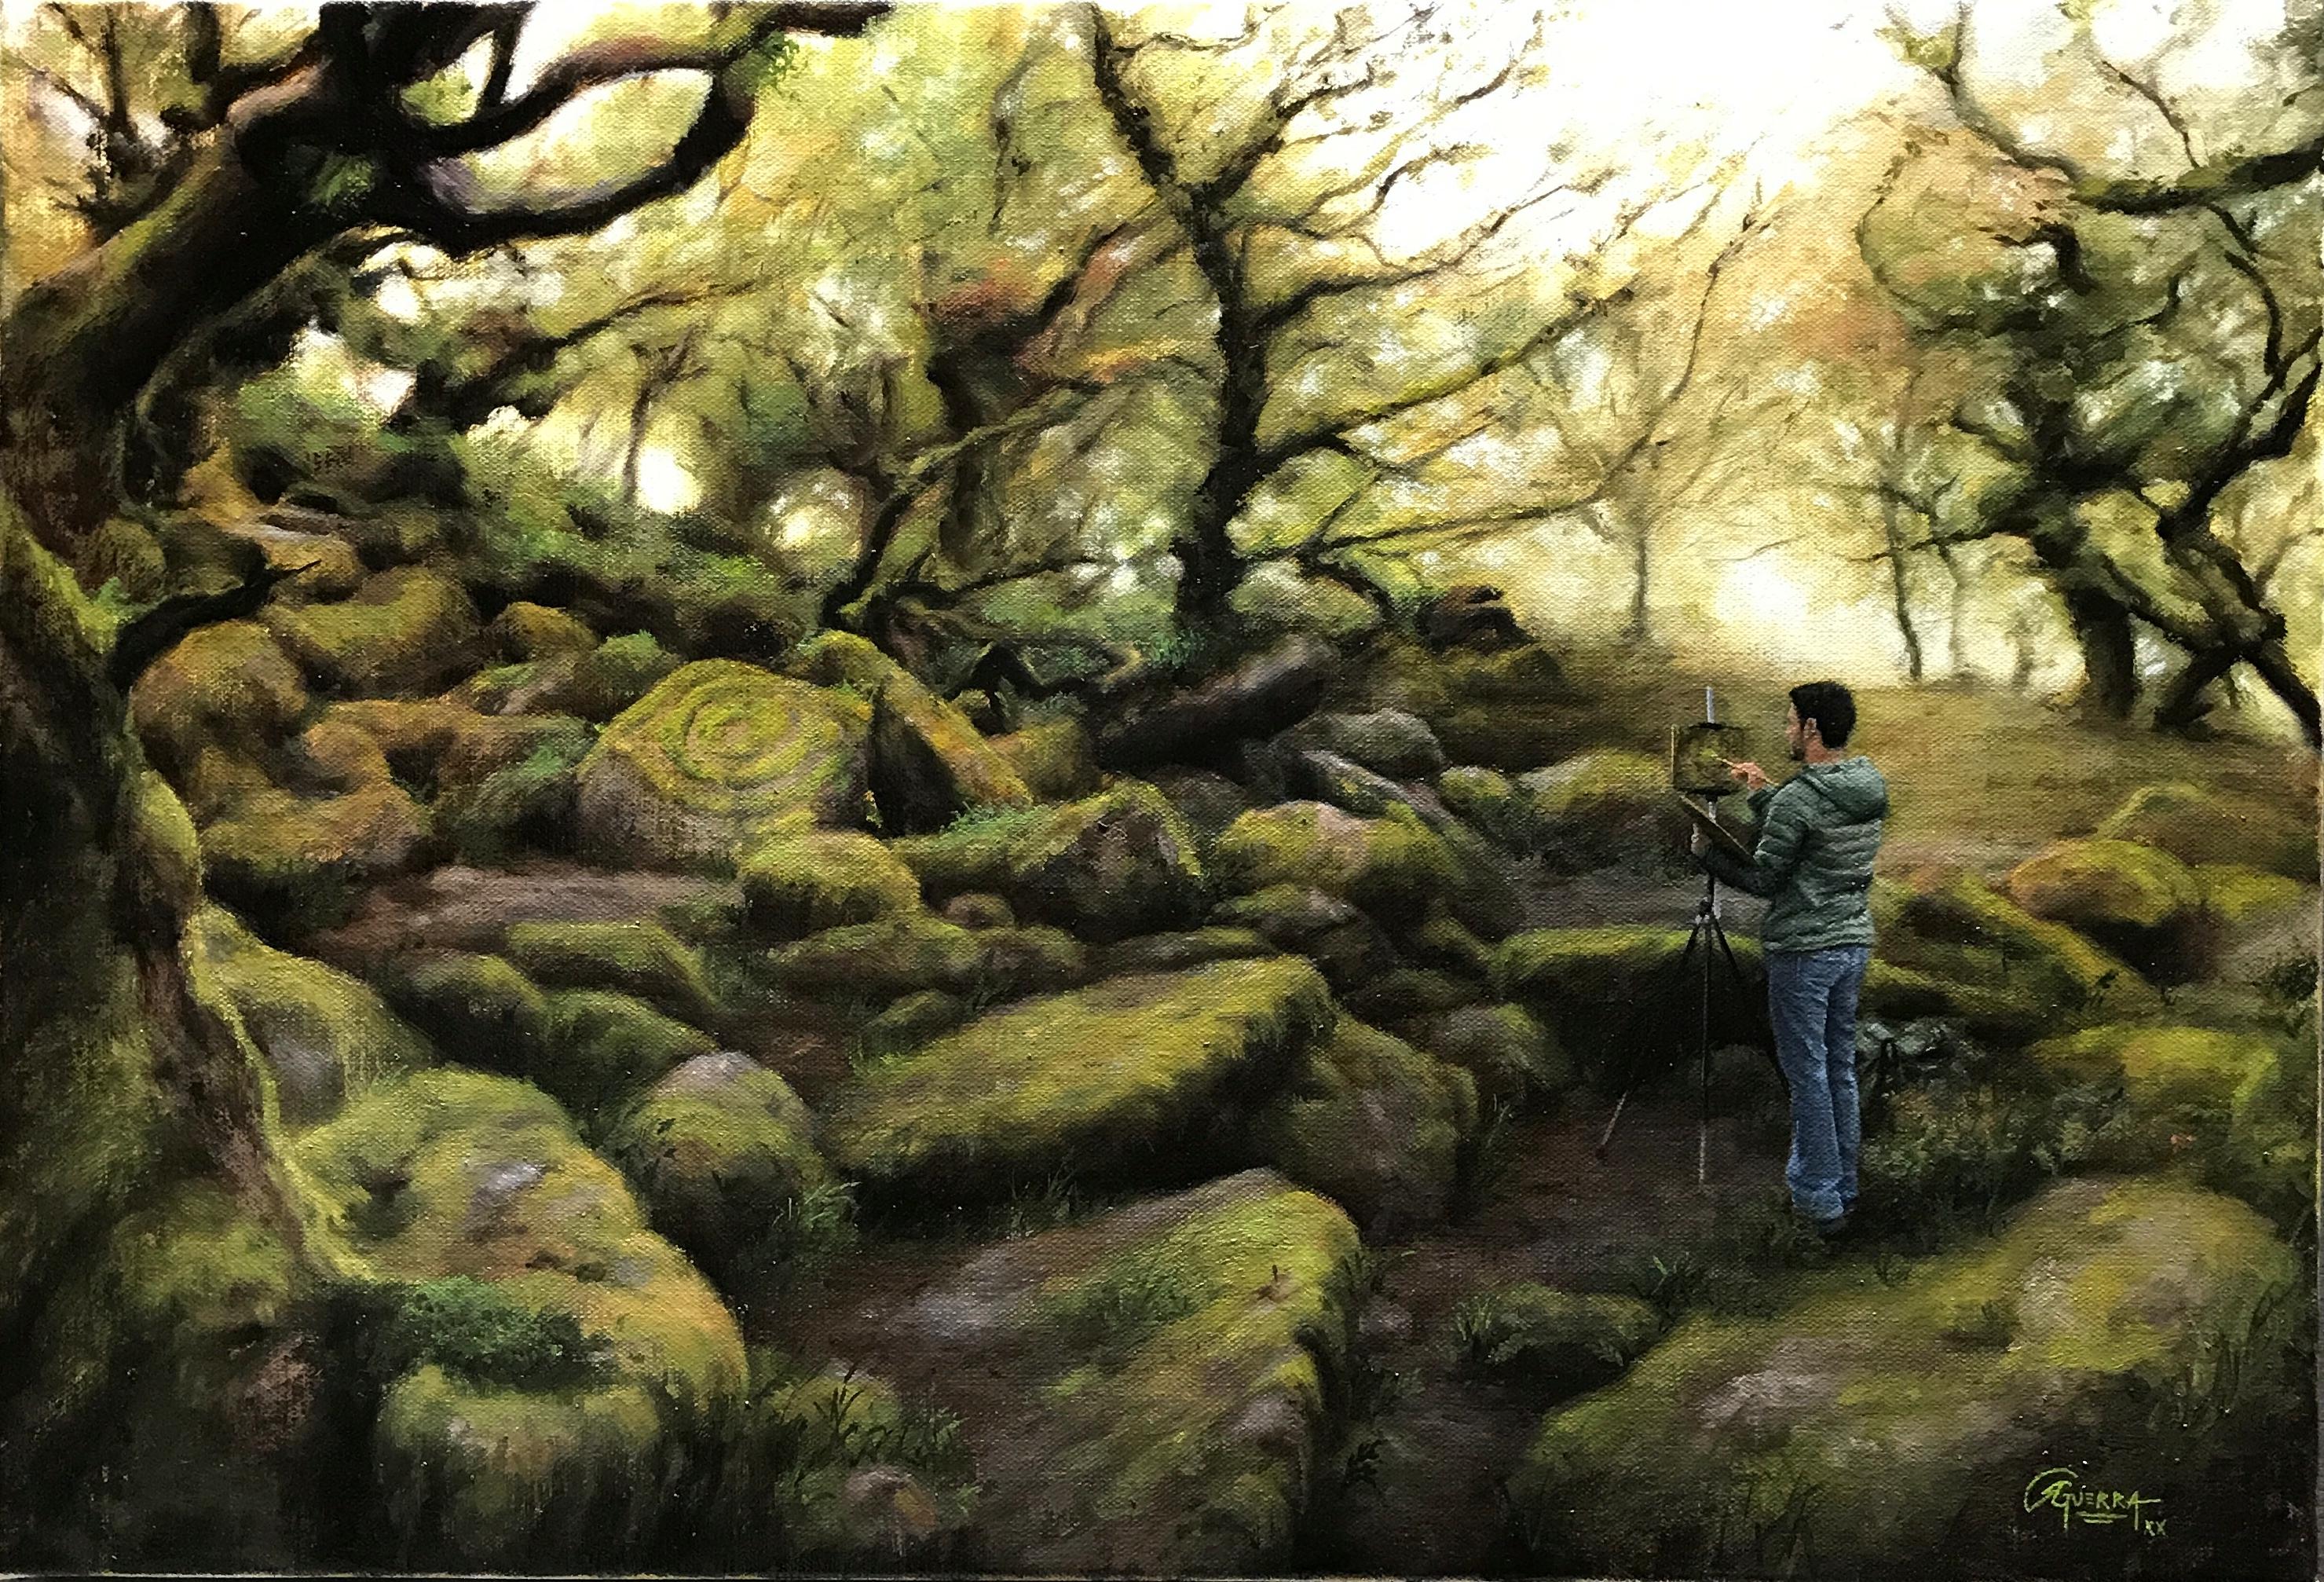 Plein Air Painting at Wistman's Wood, Rafael Guerra Painting Pintura